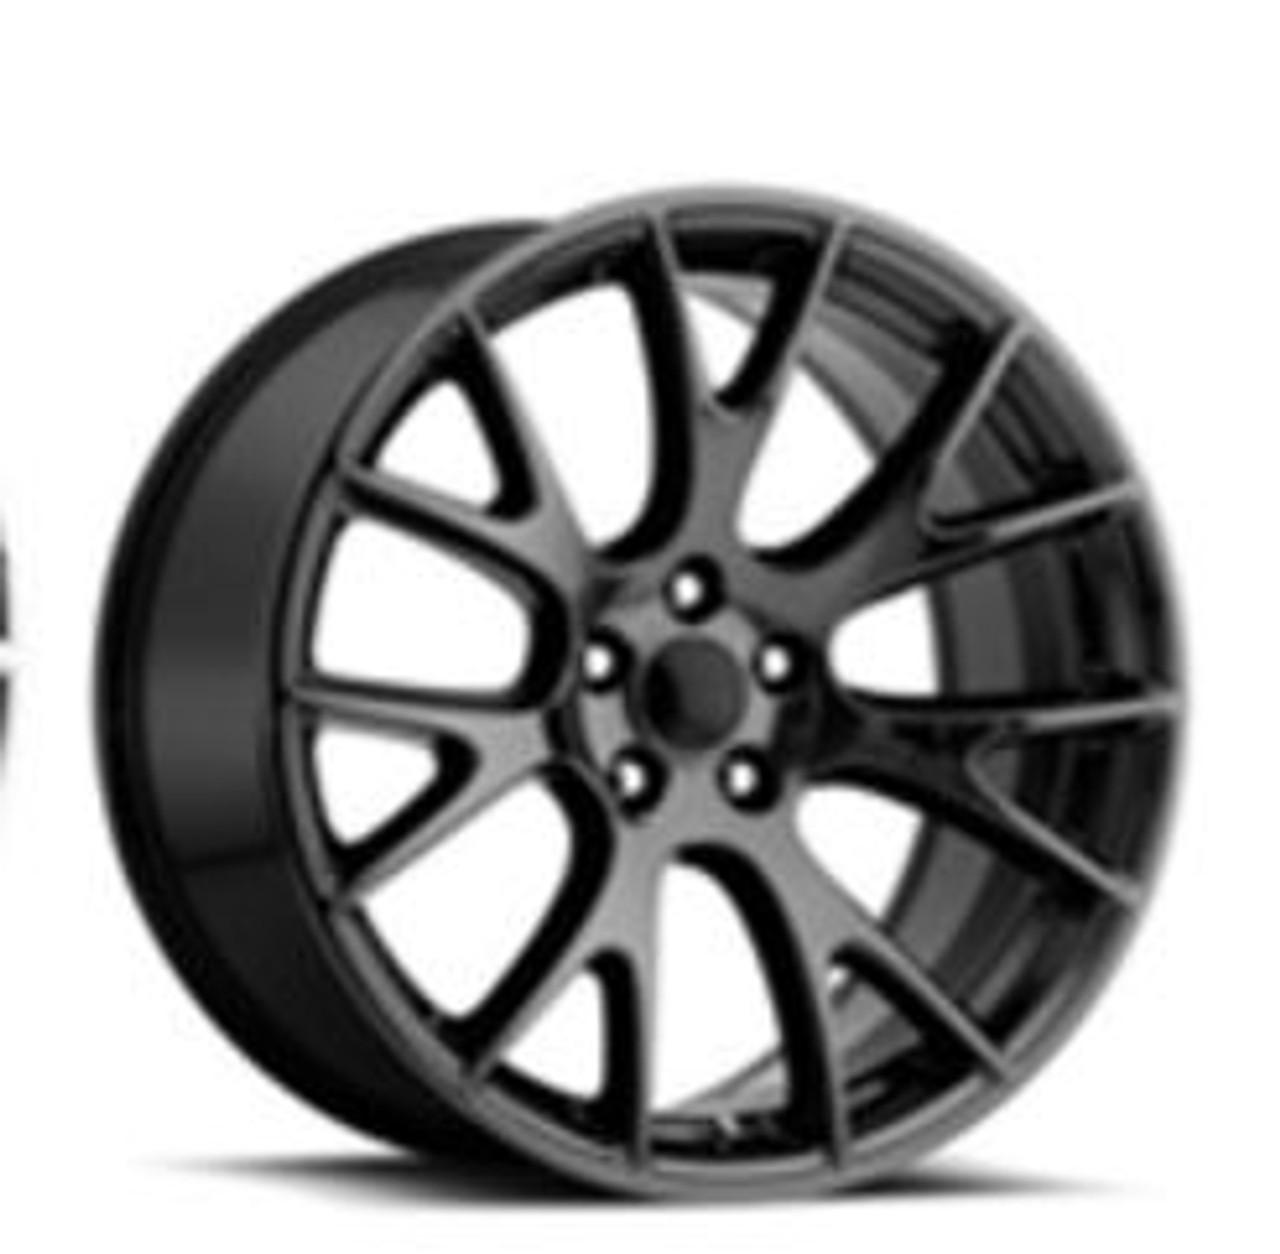 Blackchromehellcat on Dodge Durango On 22s